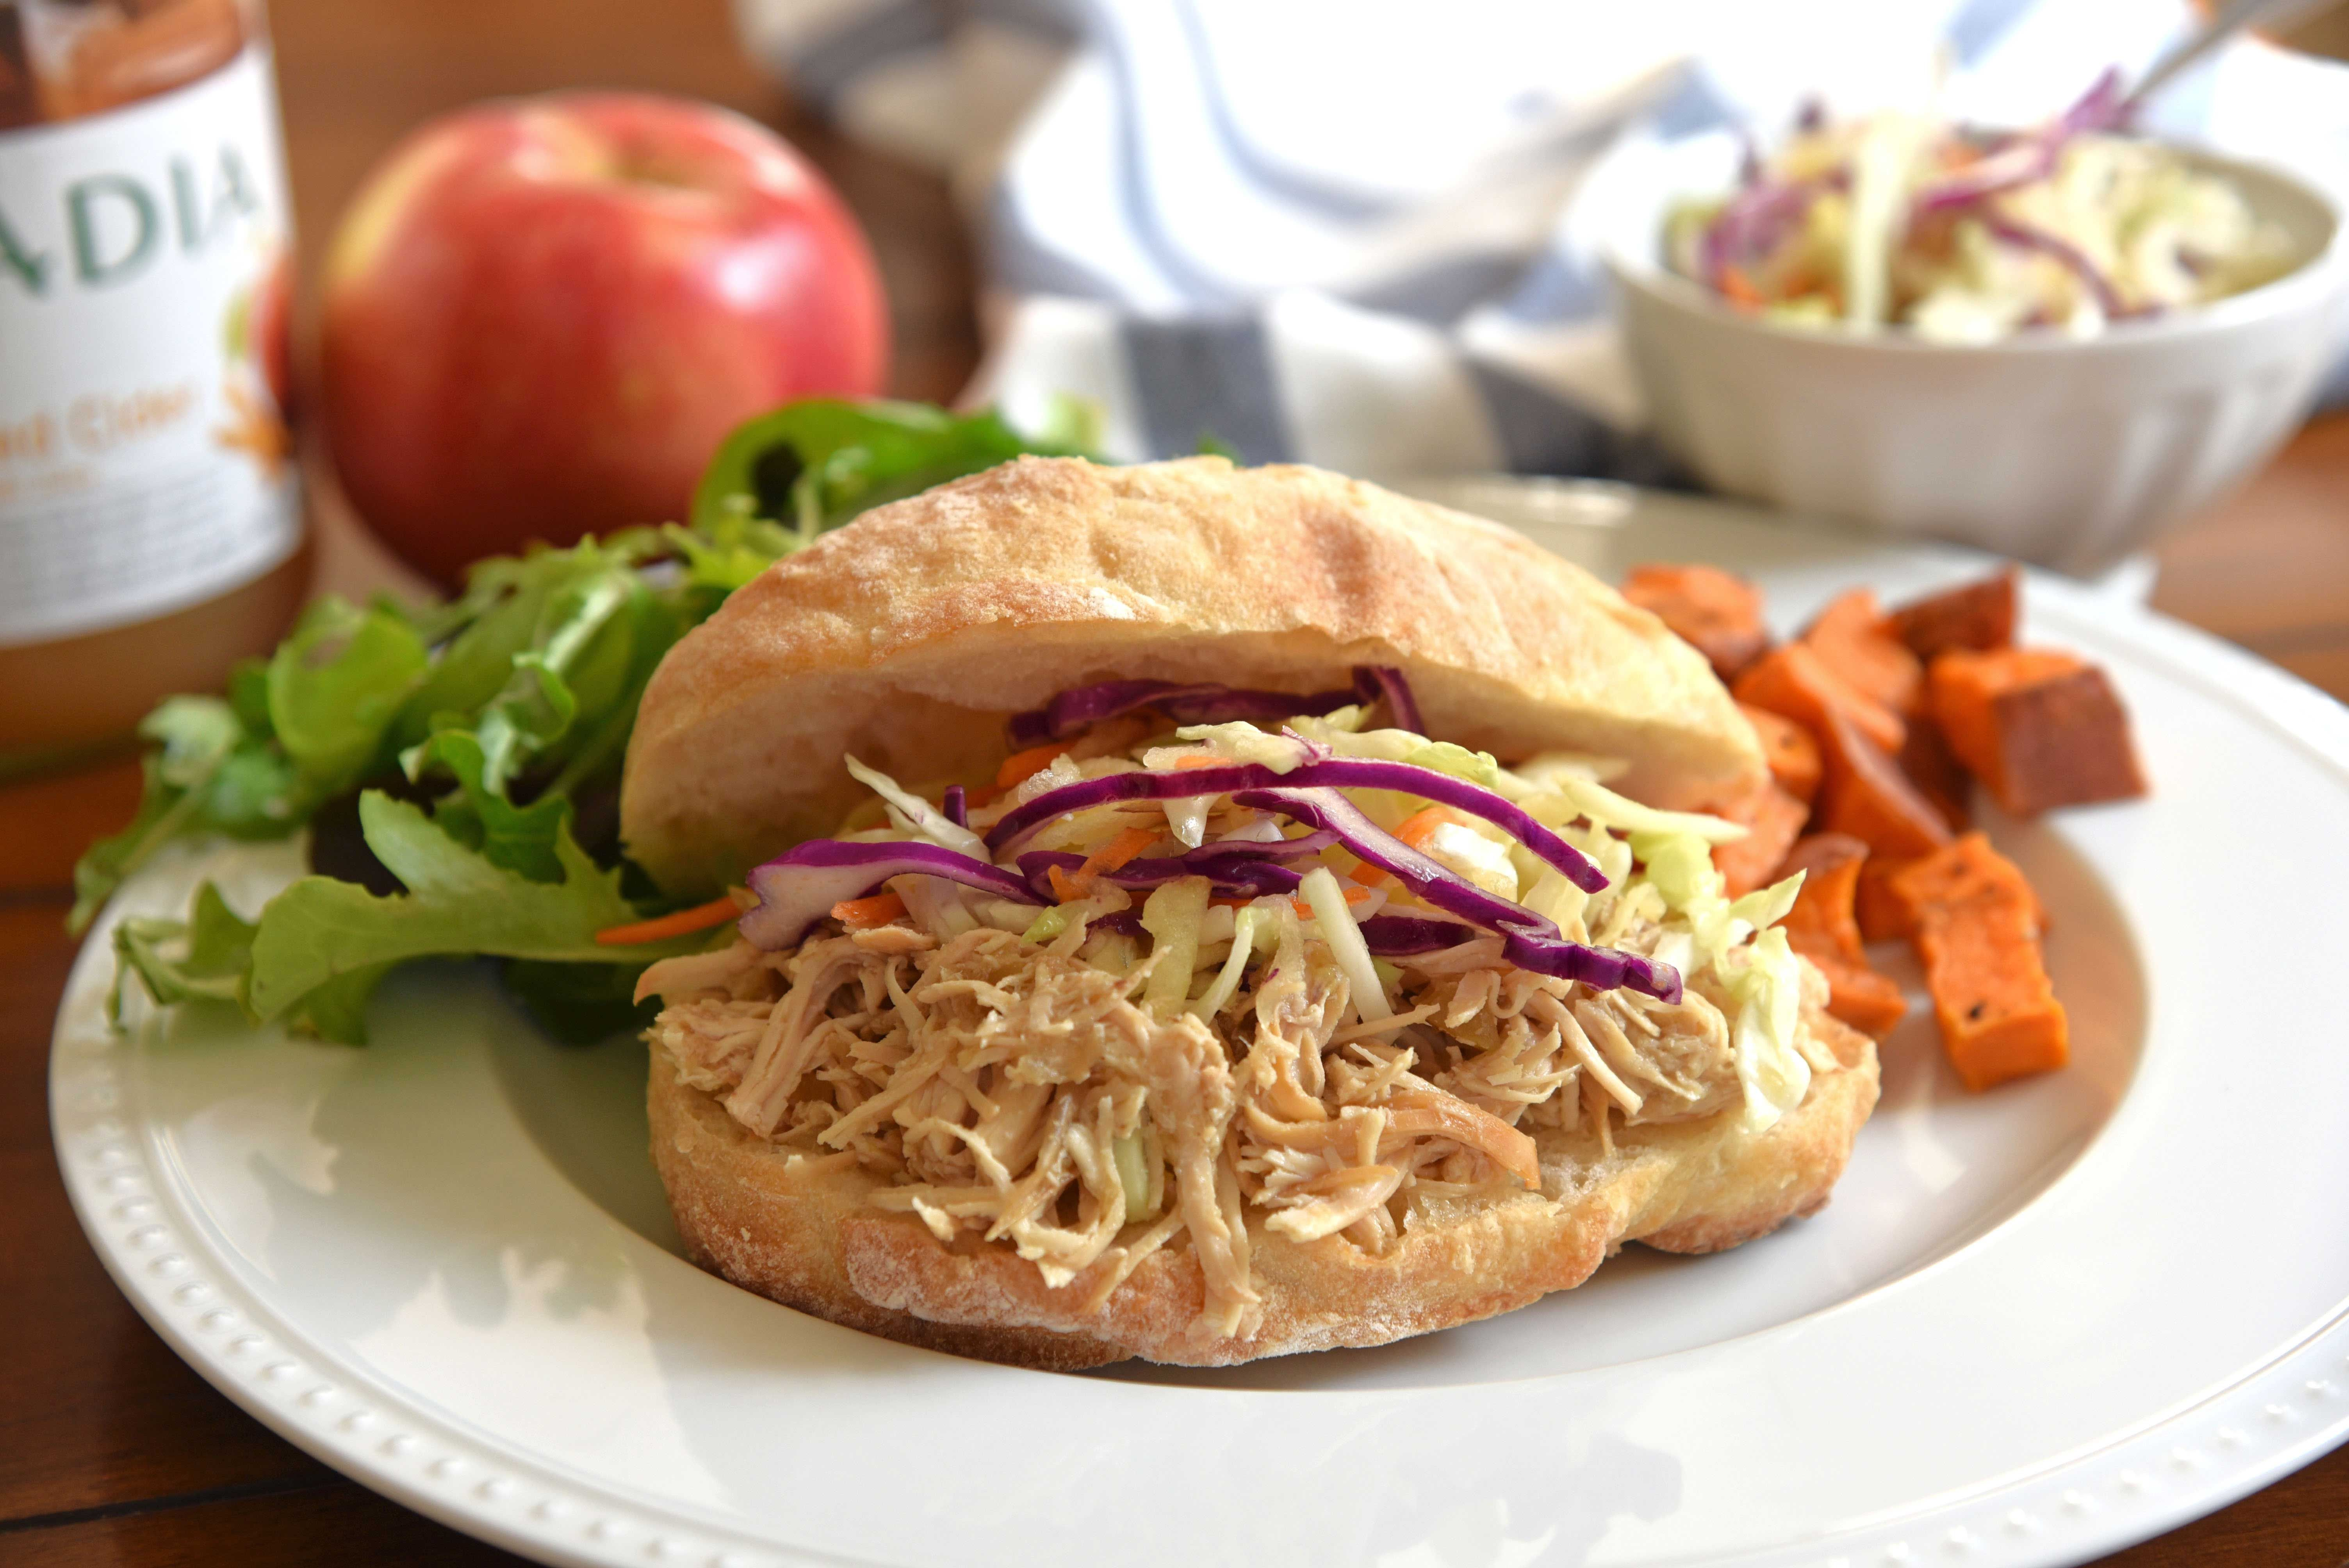 Slow Cooker Apple Cider Chicken Sandwiches | The Inspired Brunette